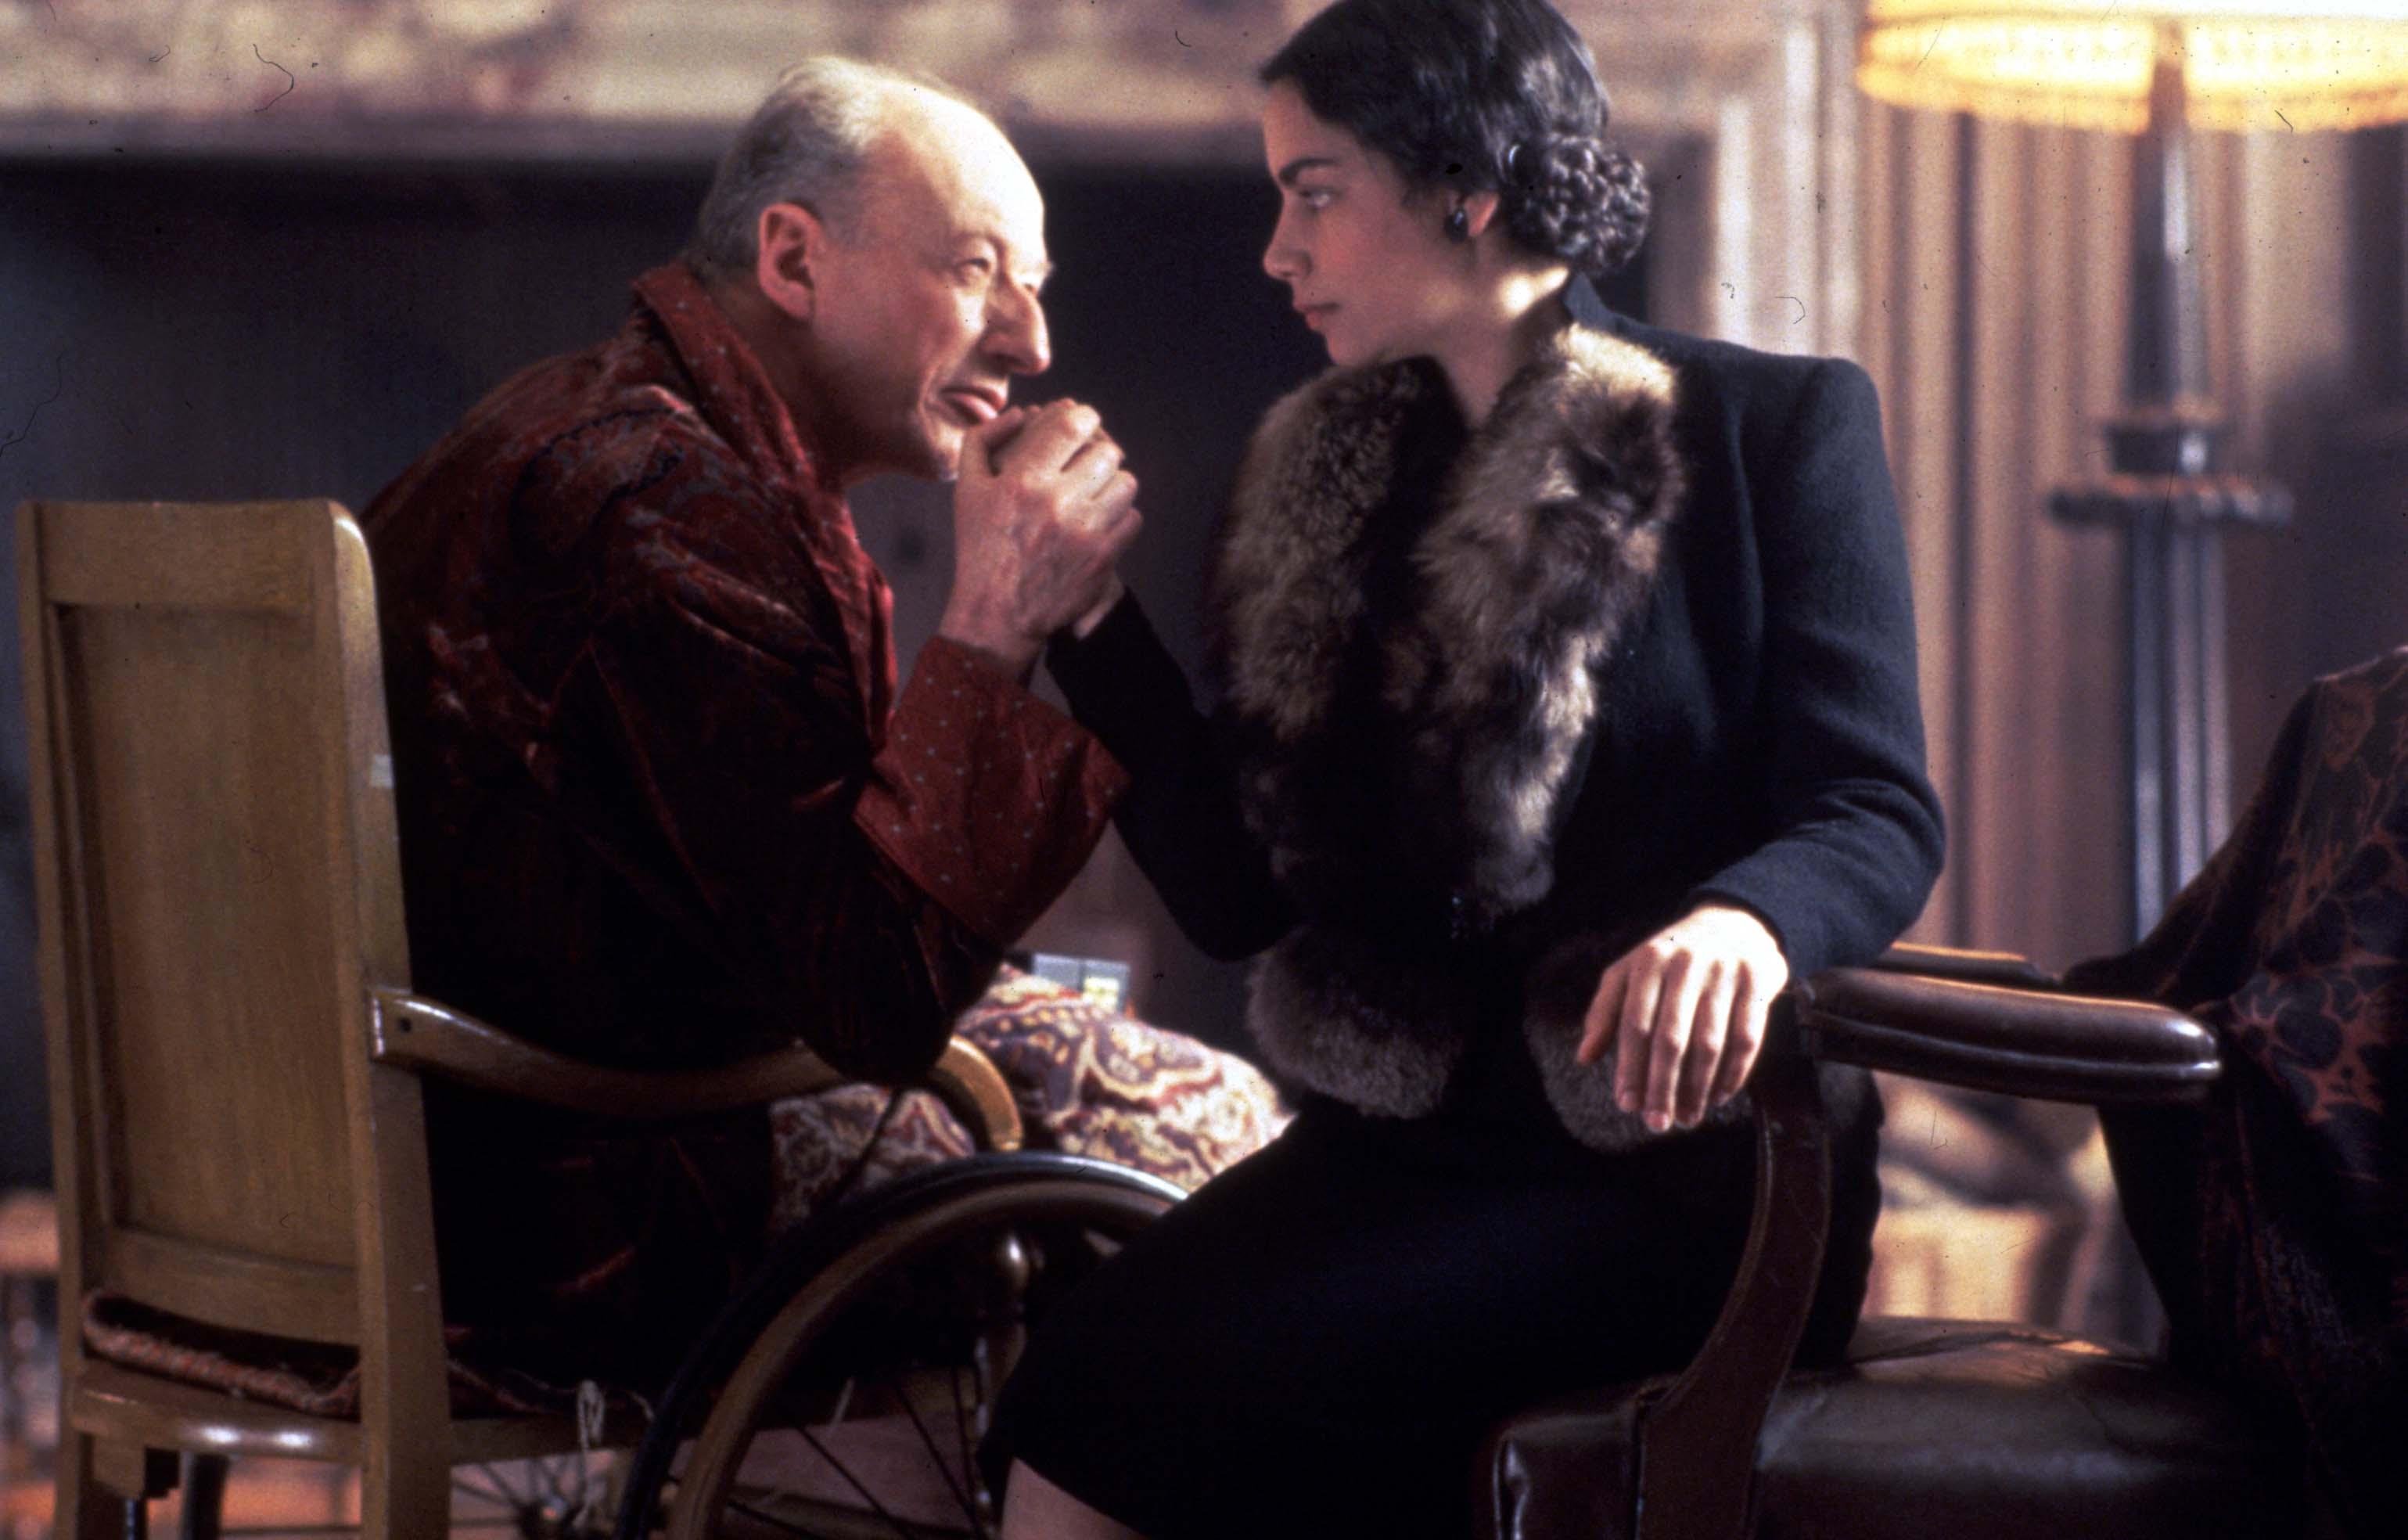 Hercule Poirots Christmas.06x01 Hercule Poirot S Christmas 1994 Agatha